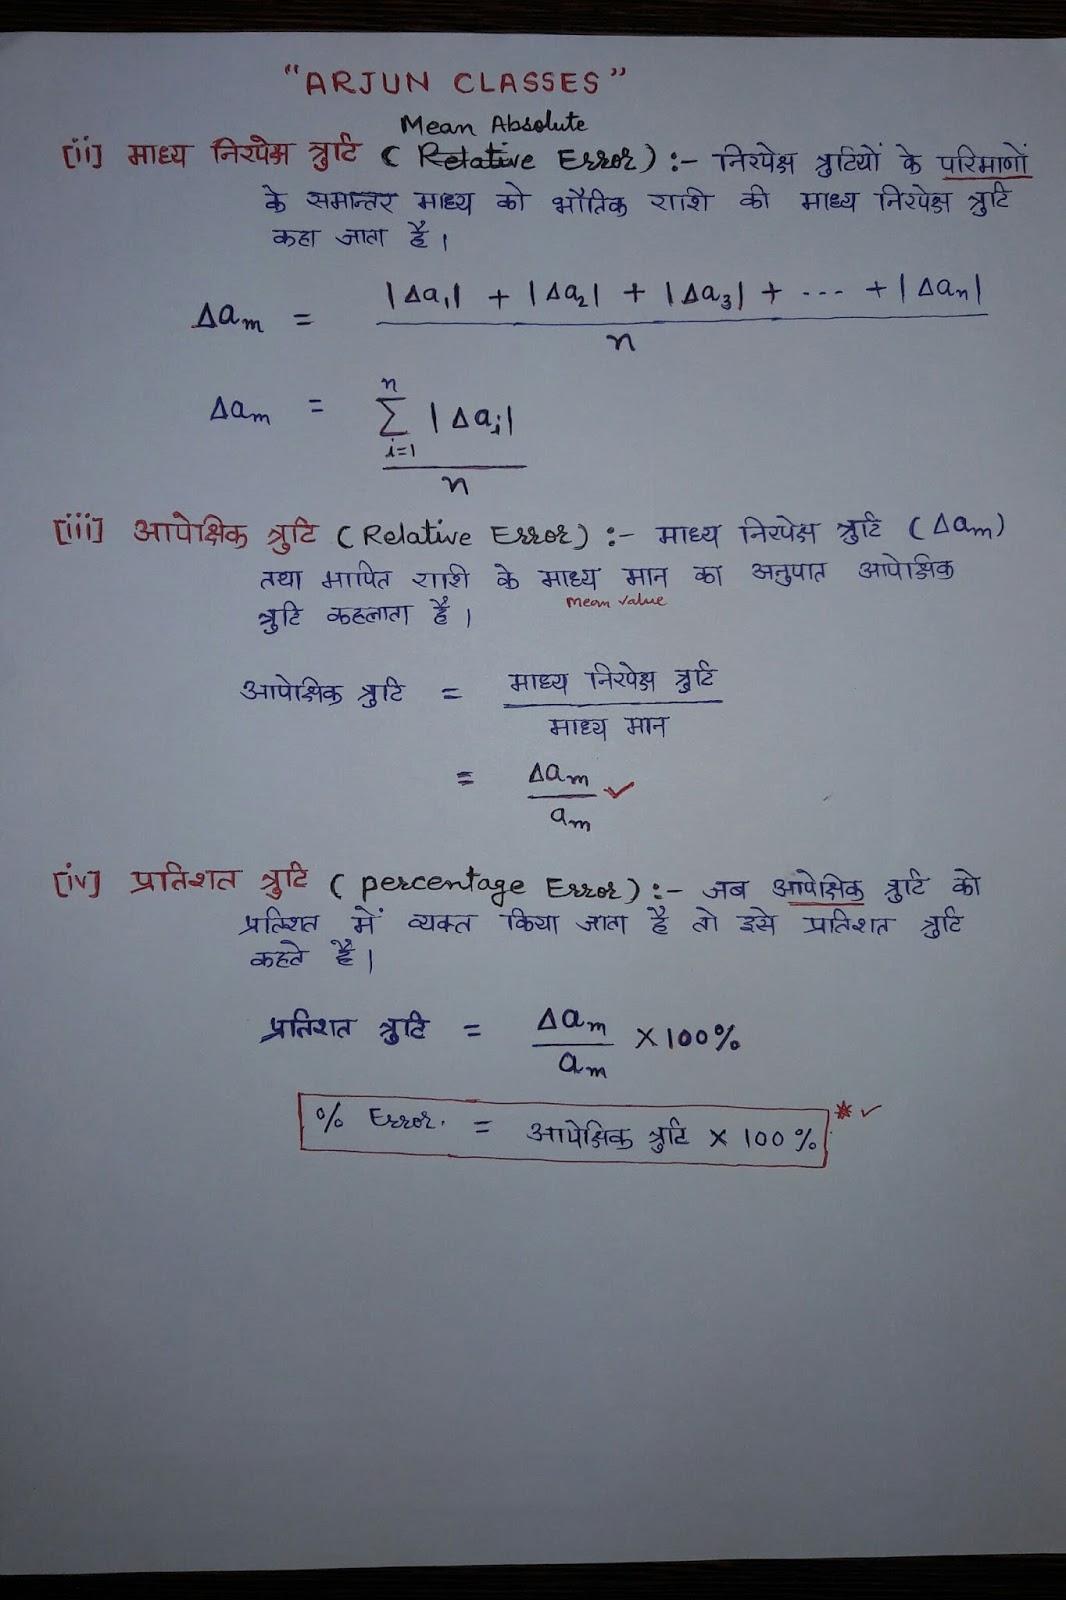 मापन में त्रुटी ( Error in Measurement ) - Hand Written